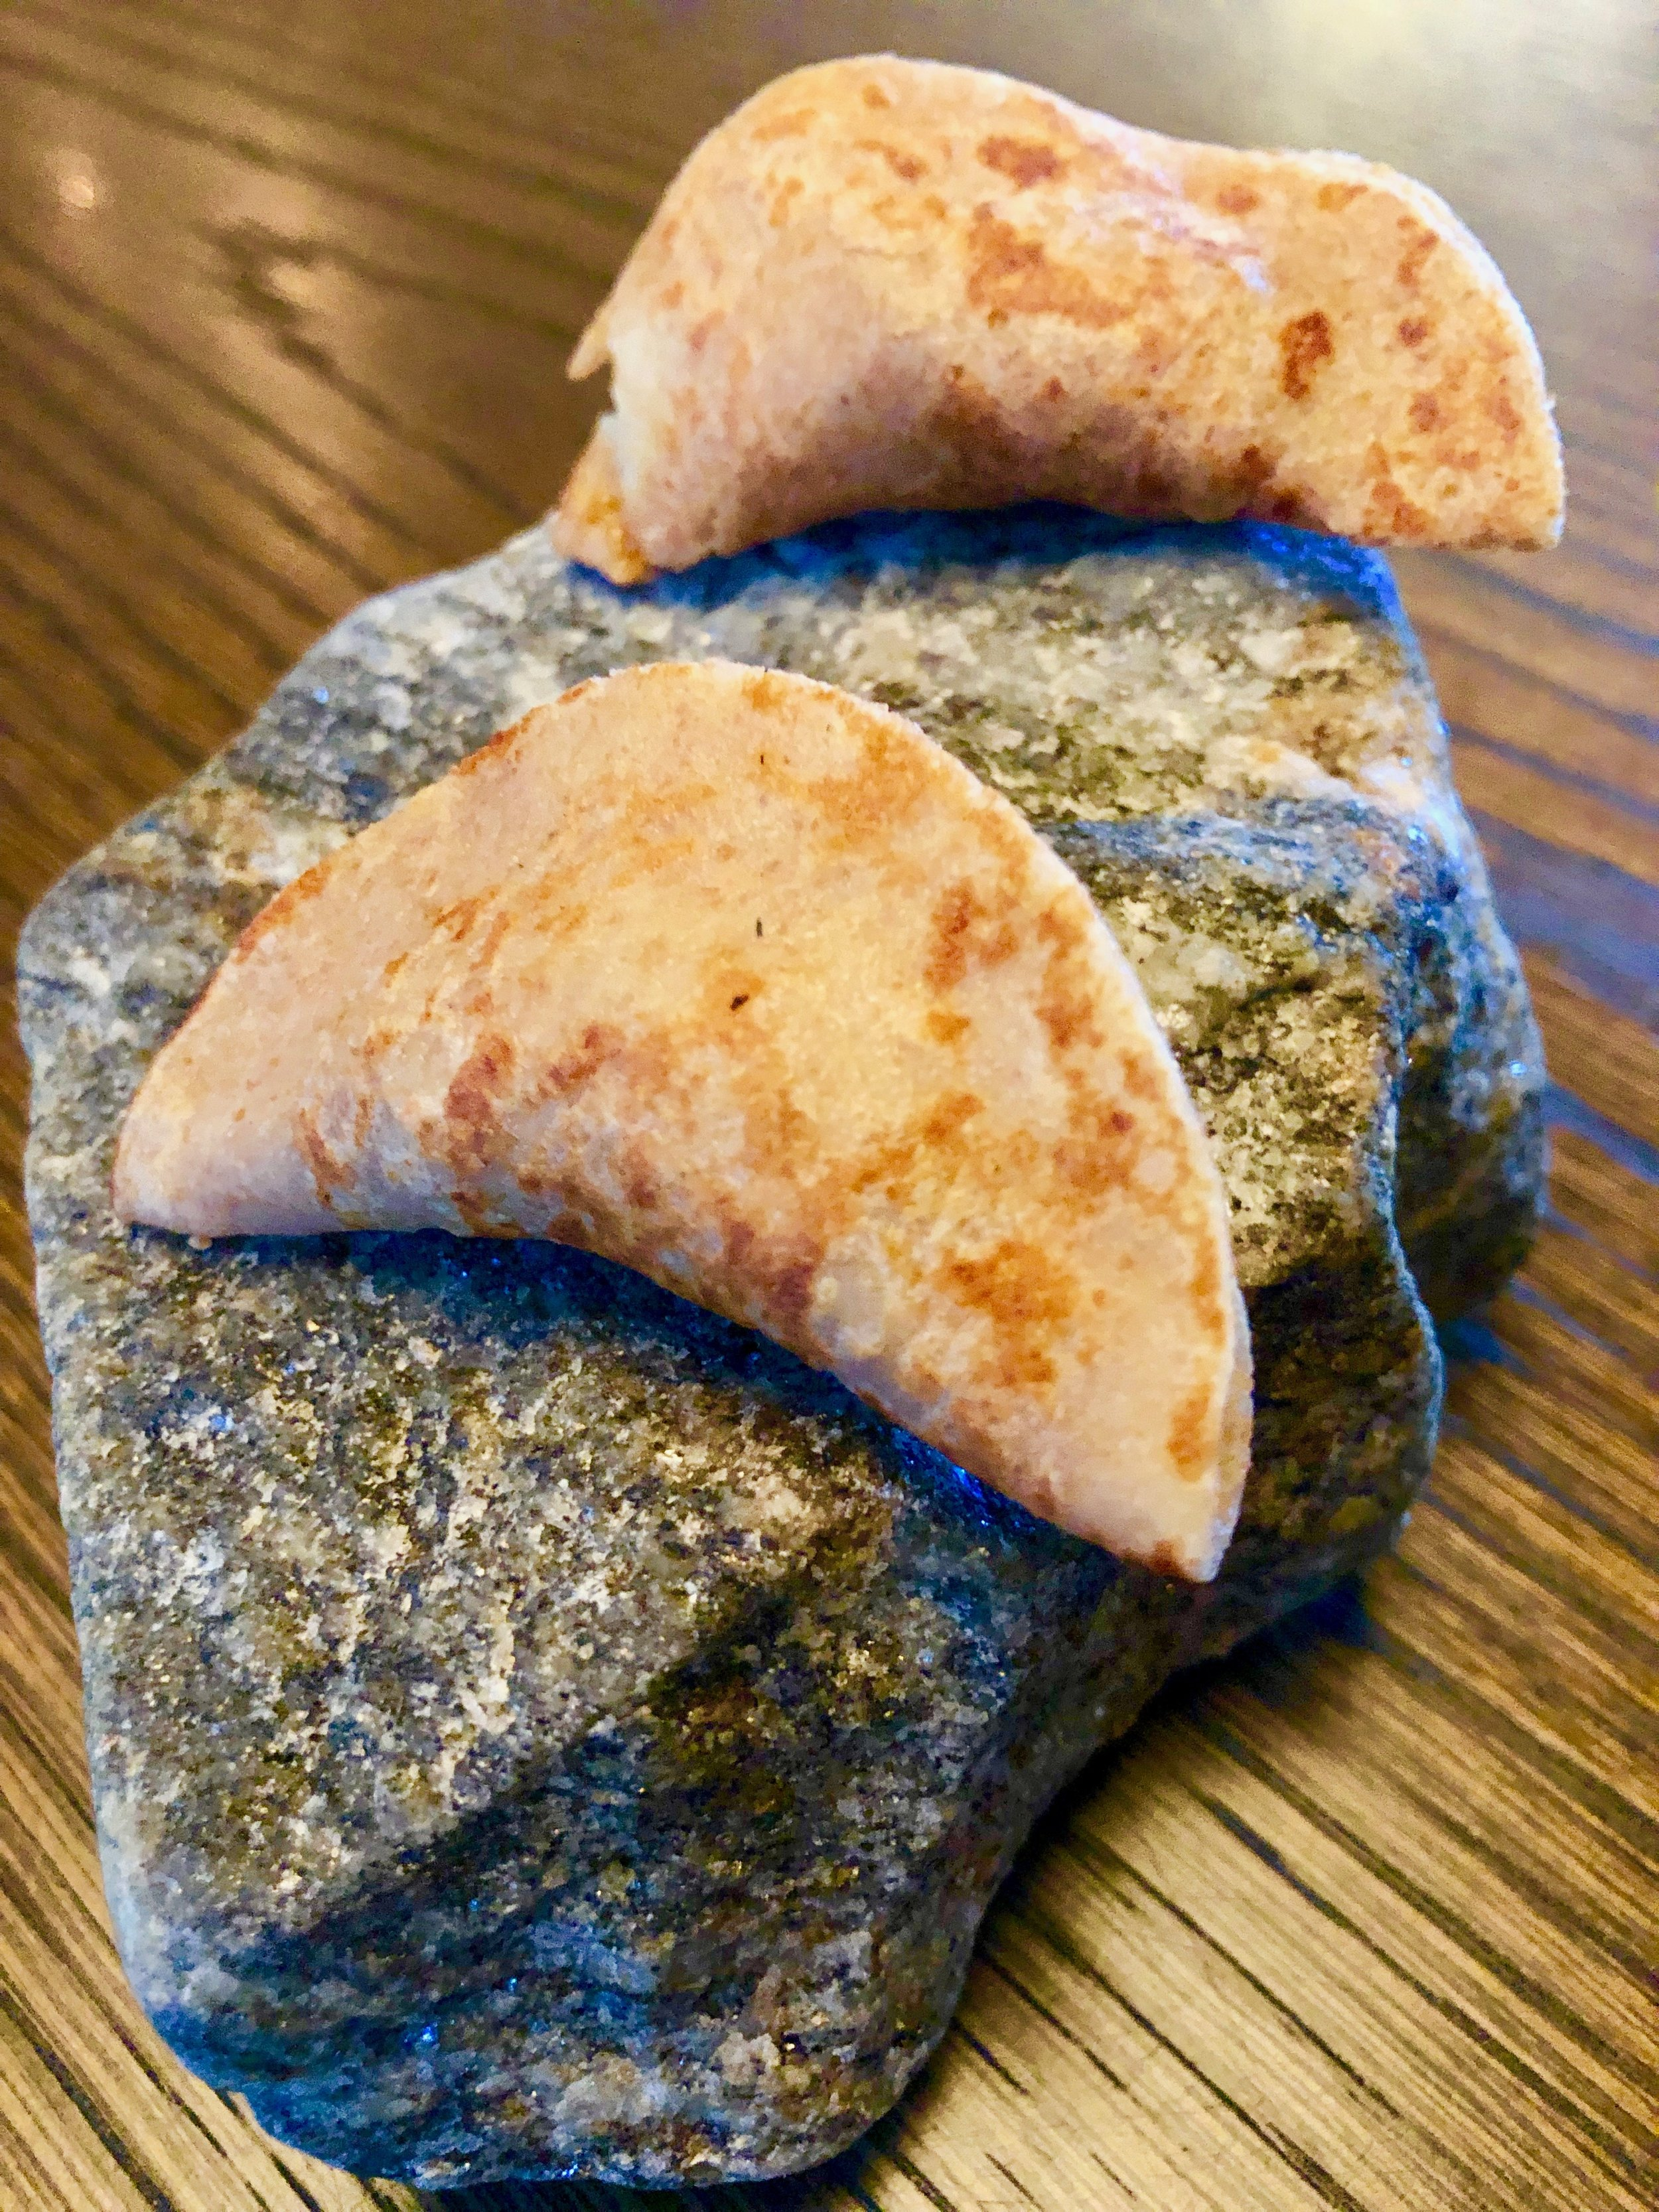 Amuse-bouche 4 – Pancake of emmer (a Eurasian wheat) with fermented plum, grilled pork and lardo from Svartskog Gard